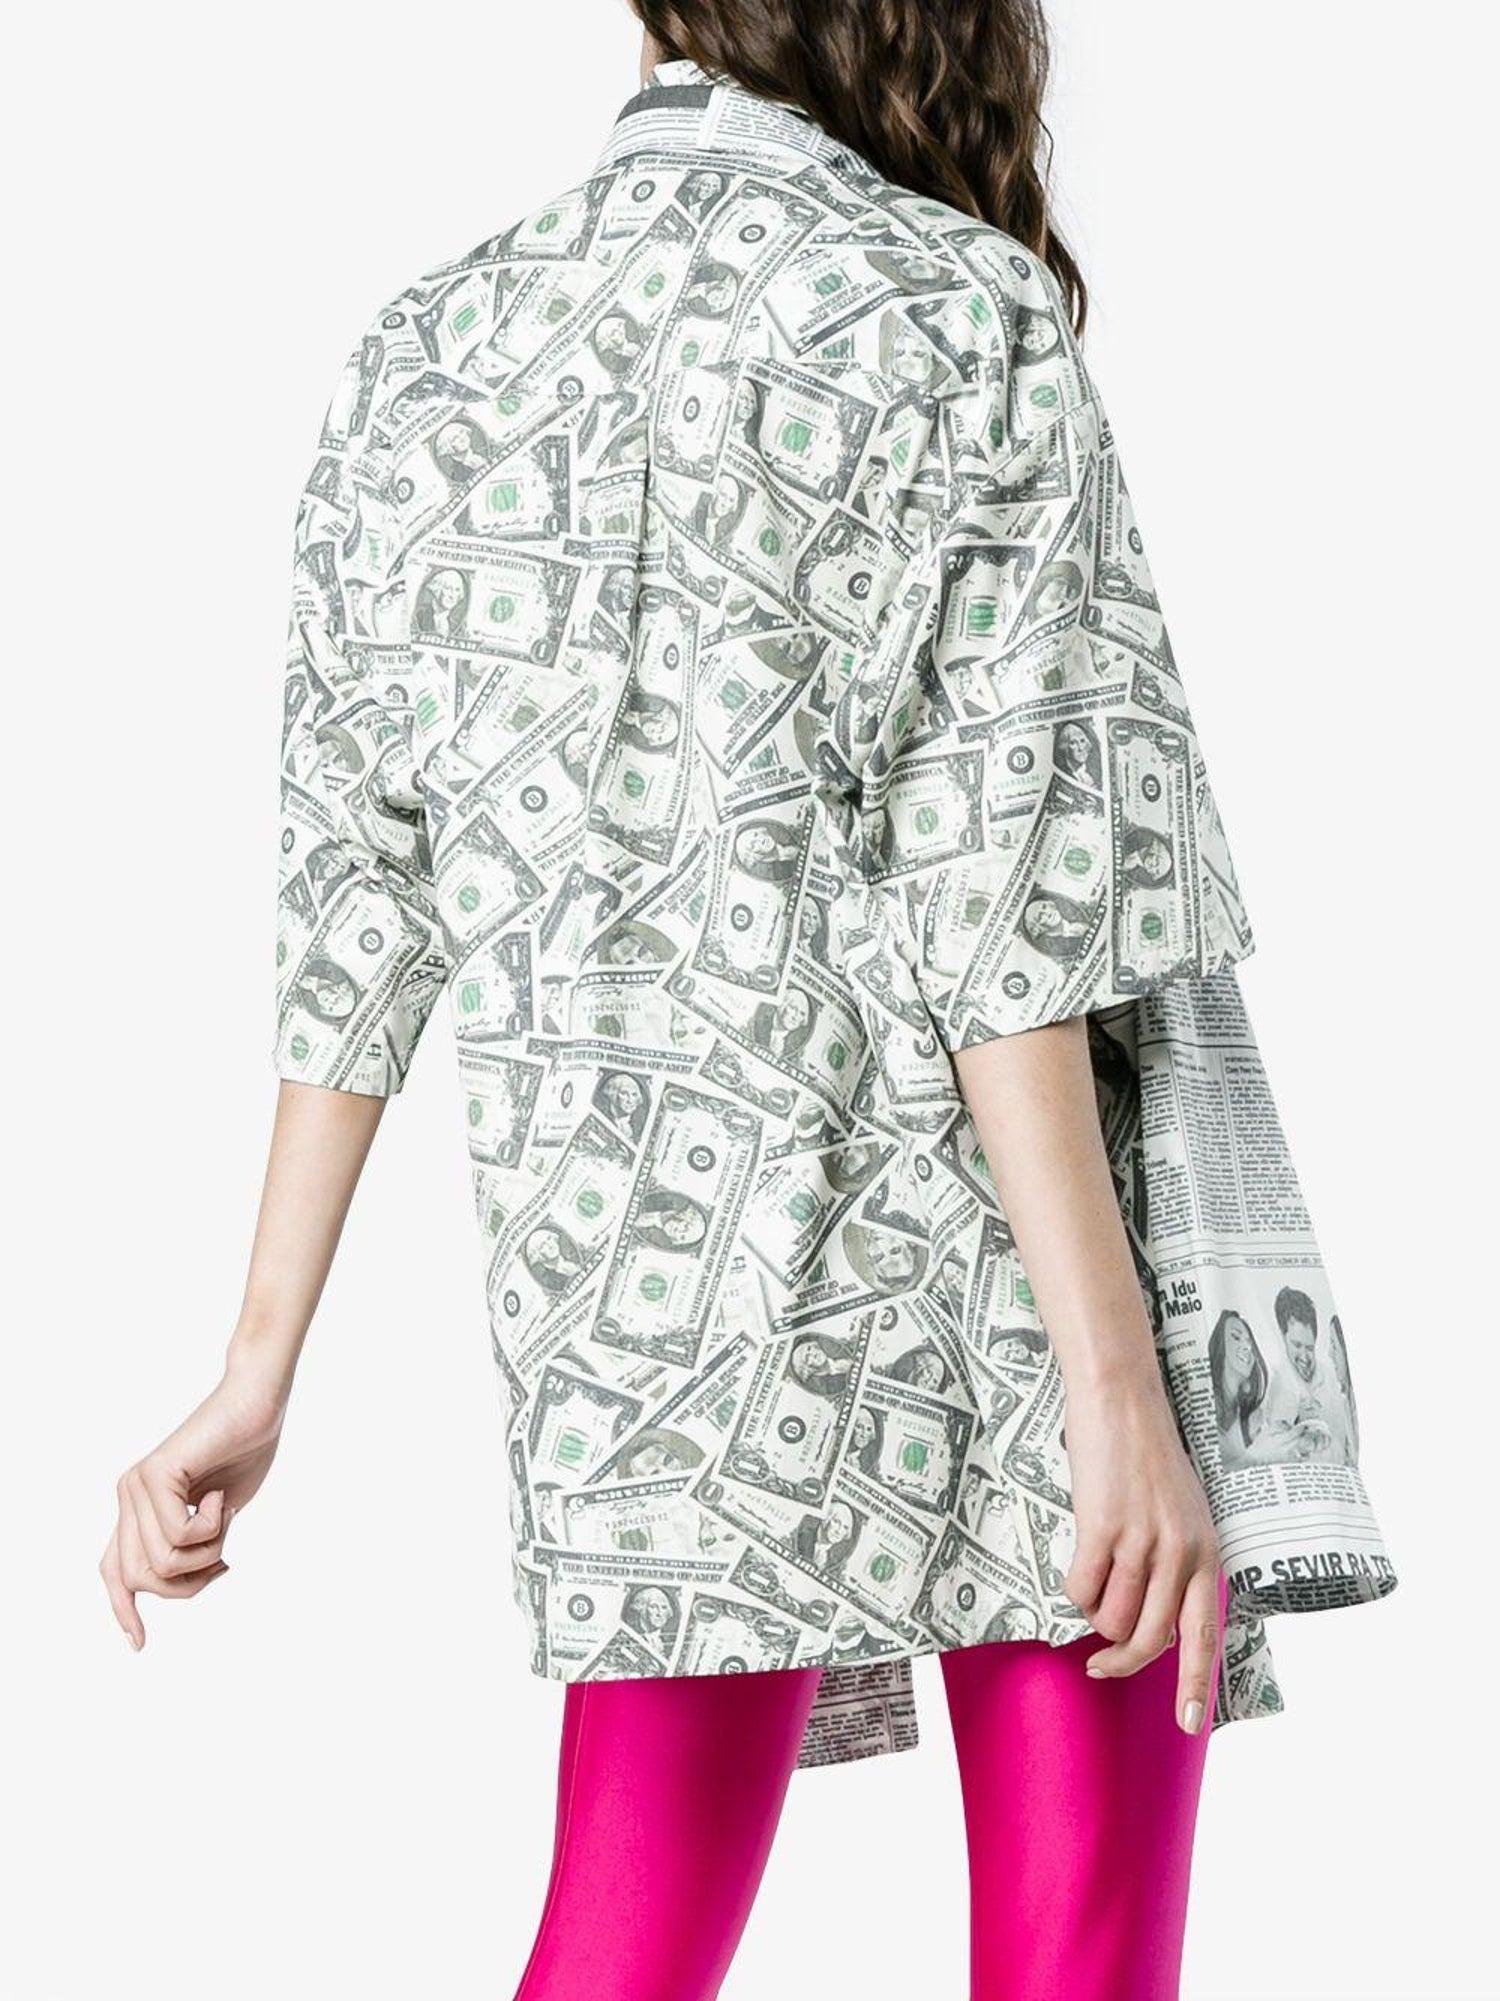 741301d4b Balenciaga Money $$ Print Shirt Oversized Size 40 NEW For Sale at 1stdibs